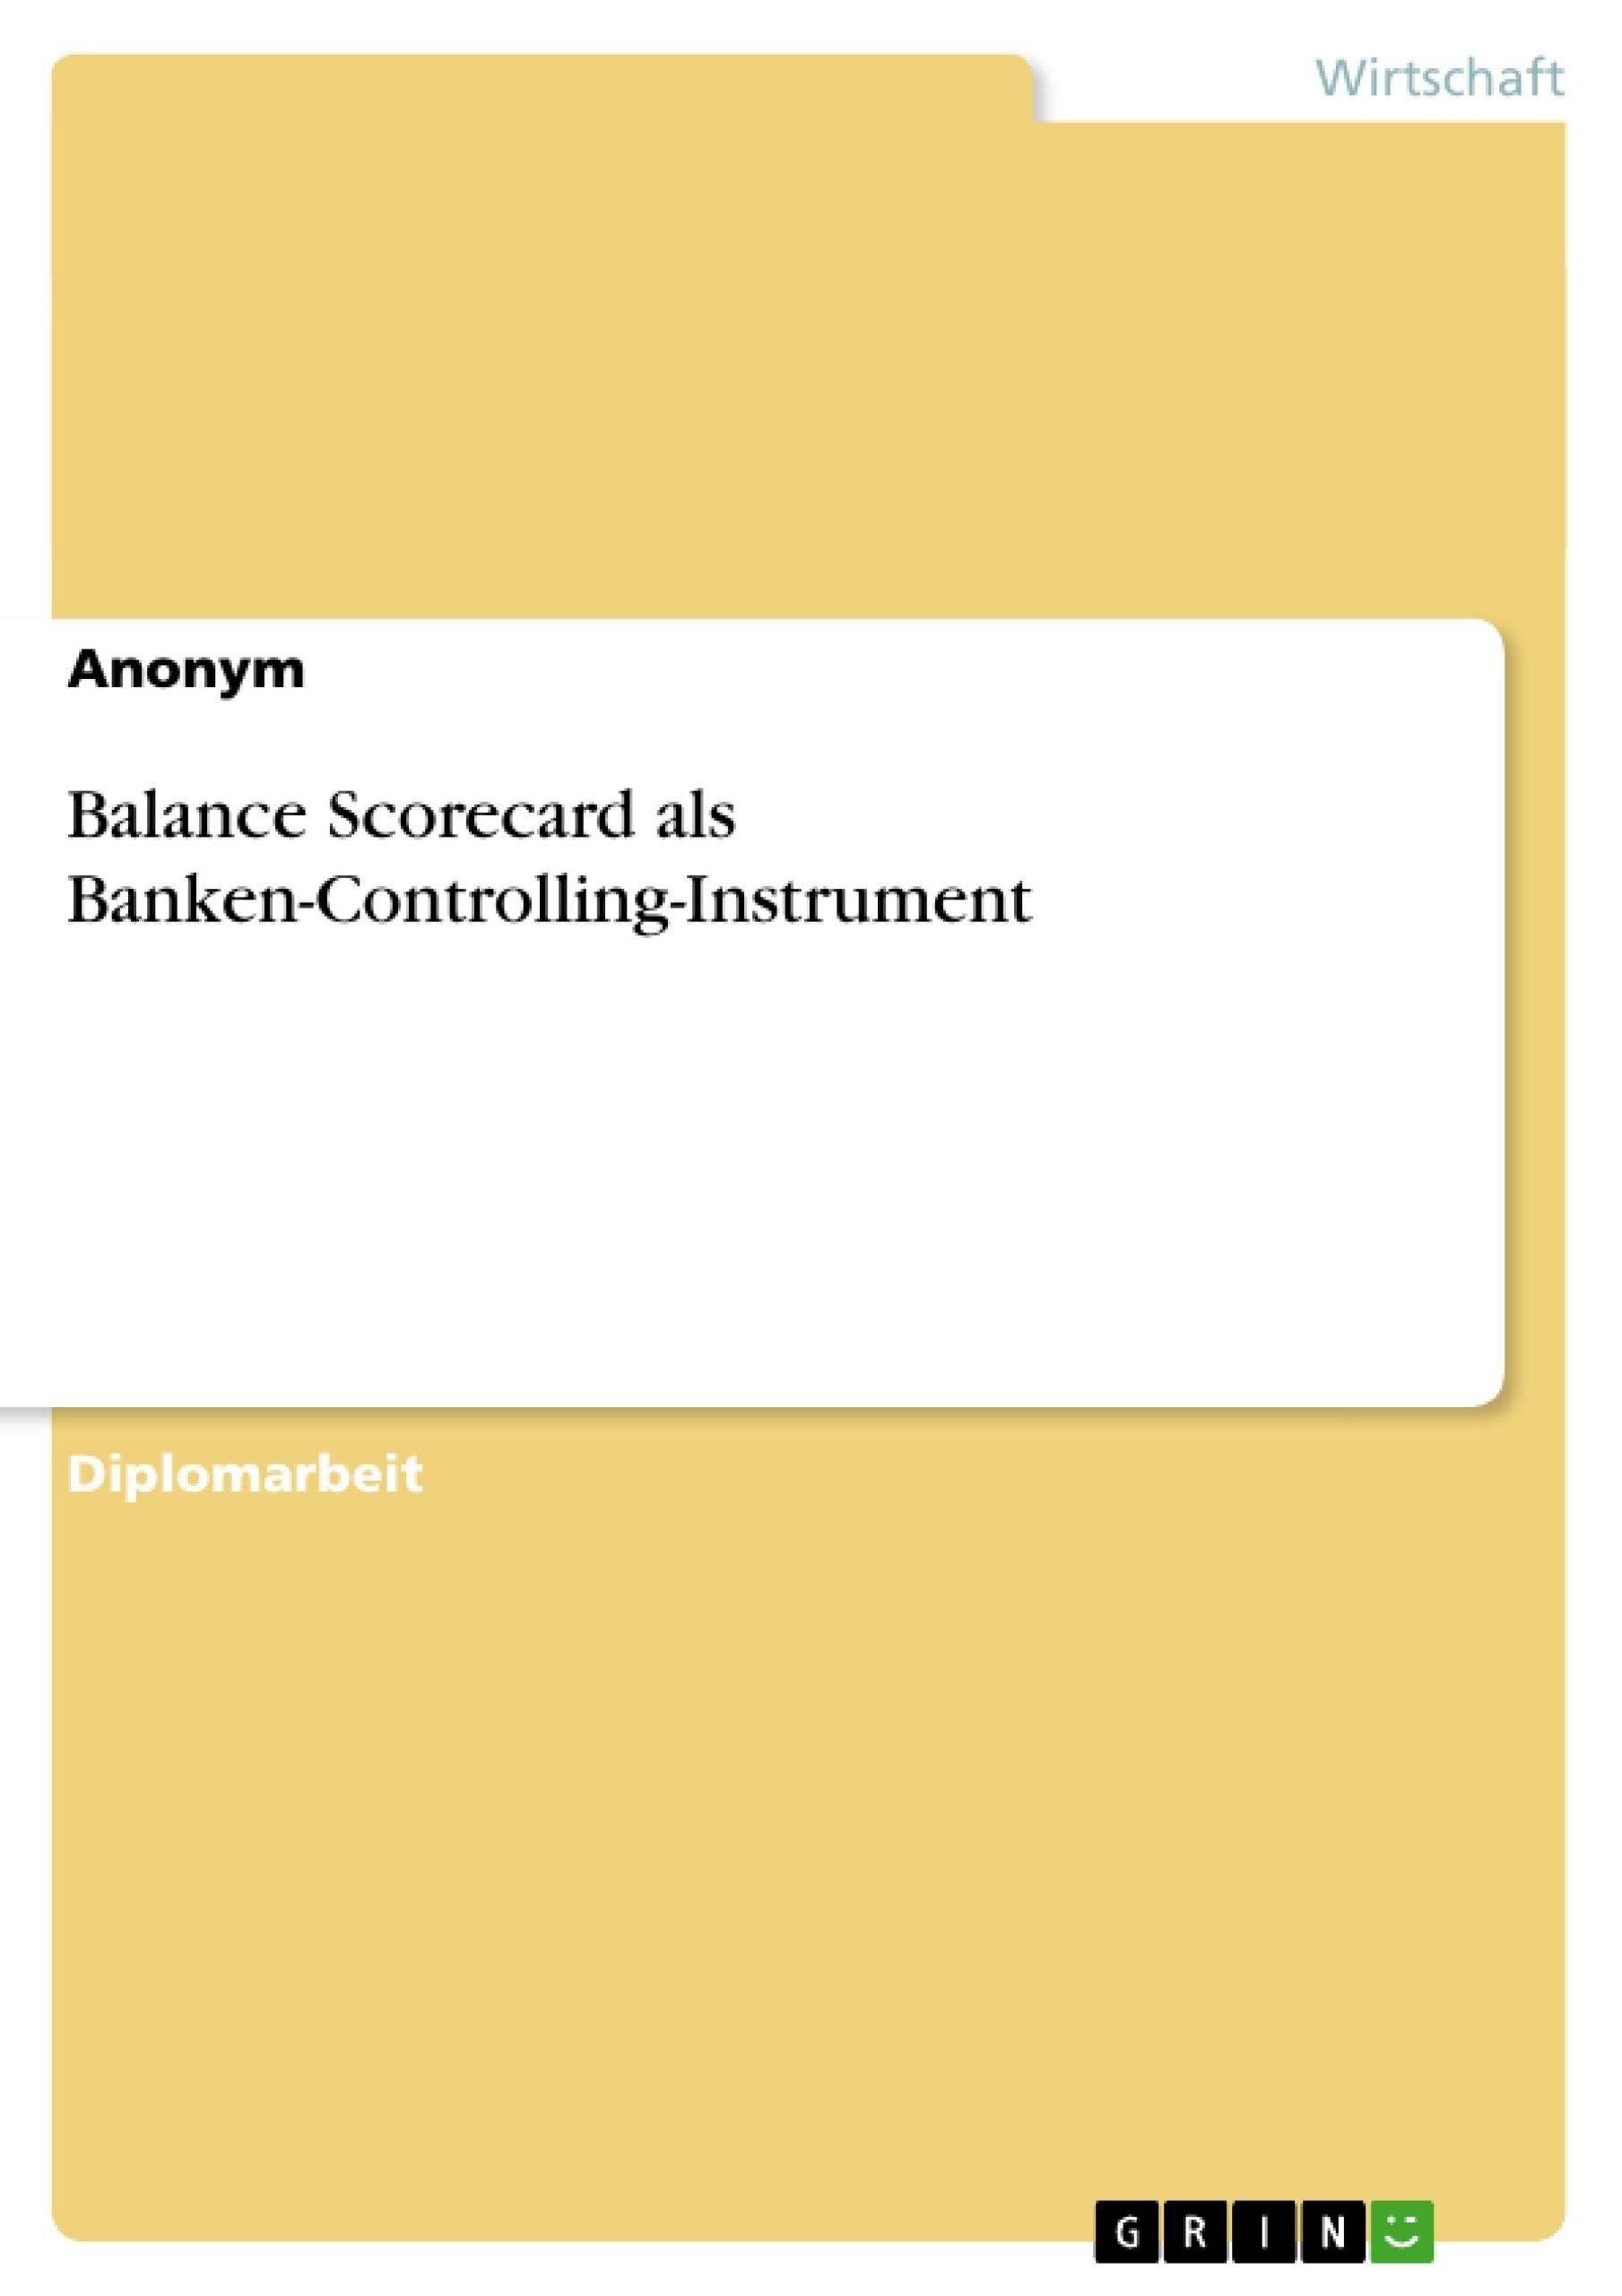 Titel: Balance Scorecard als Banken-Controlling-Instrument